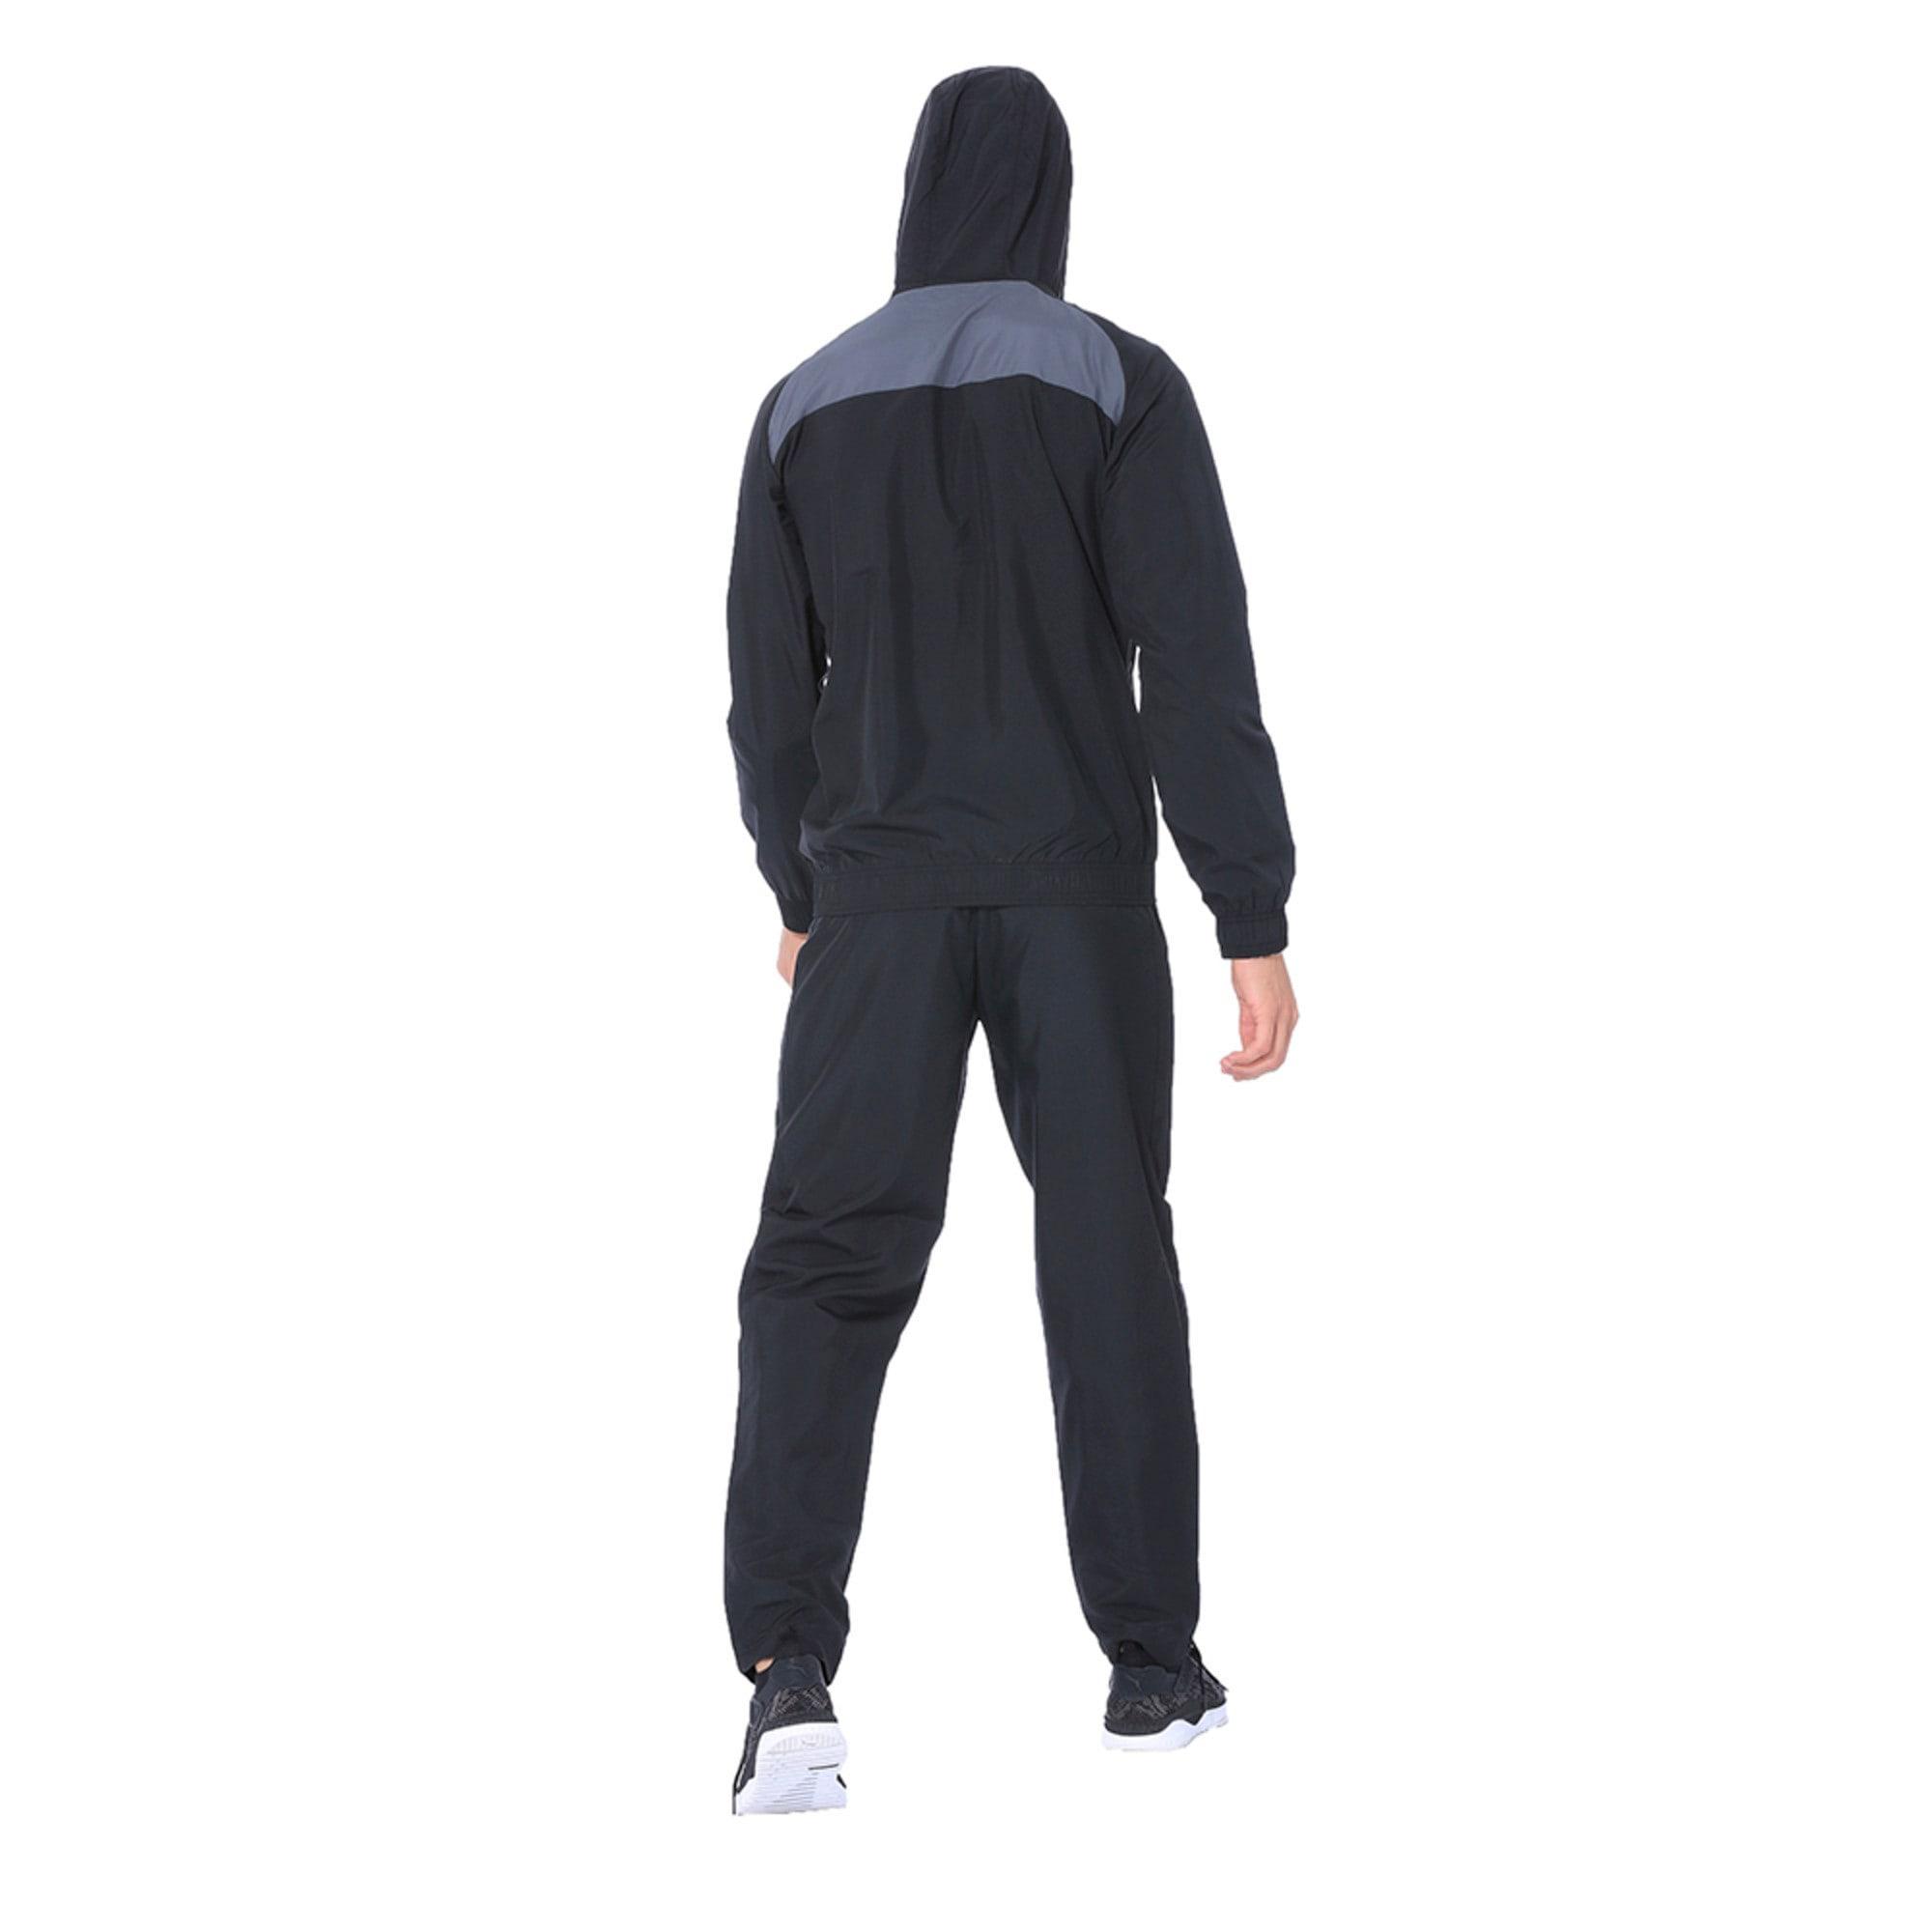 Thumbnail 5 of Modern Sport Hooded Suit Op. Peacoat-Pum, Puma Black-Iron Gate, medium-IND